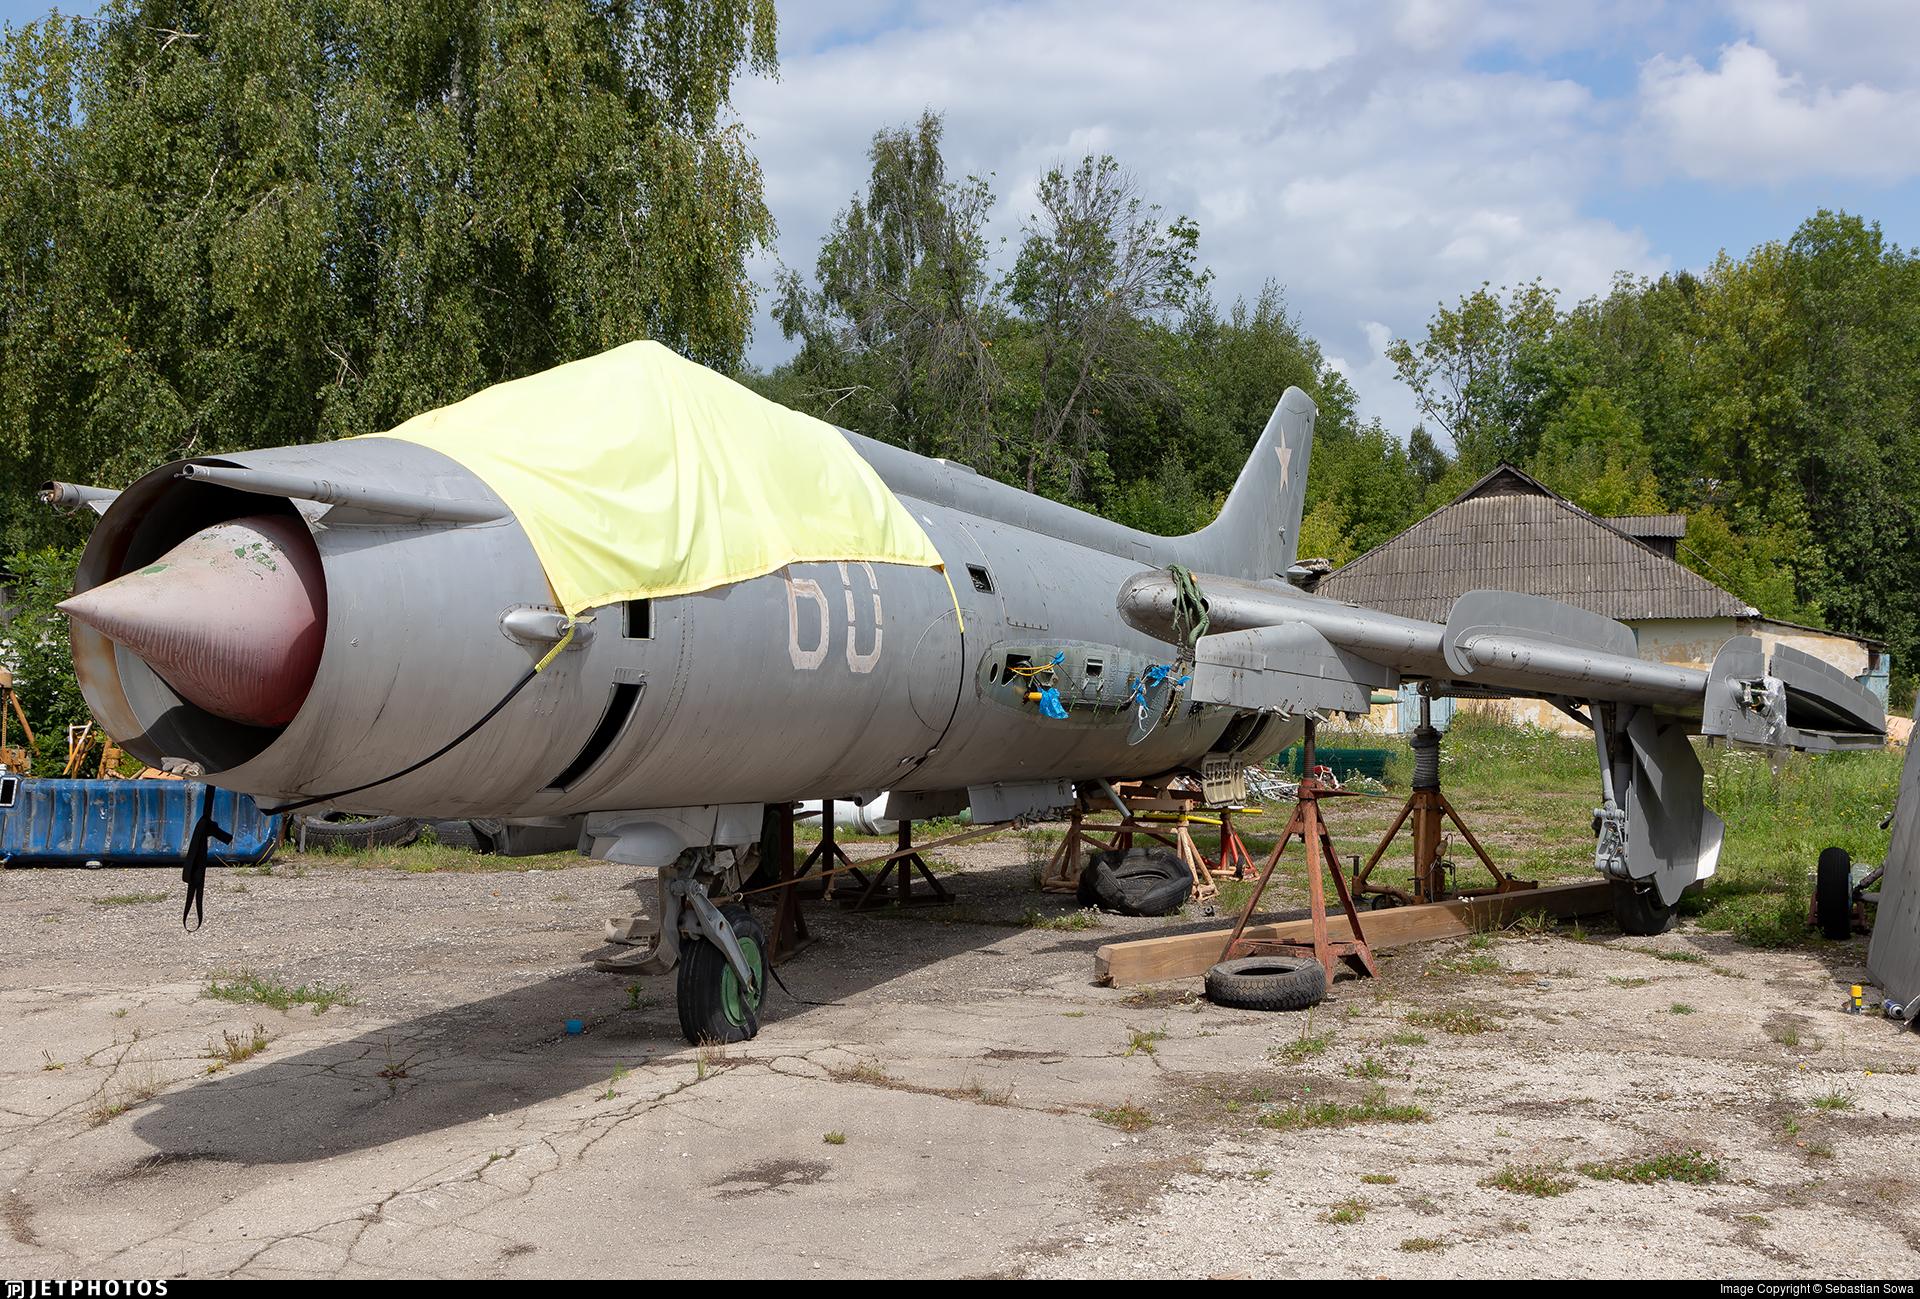 60 - Sukhoi Su-22M4 Fitter K - Soviet Union - Air Force